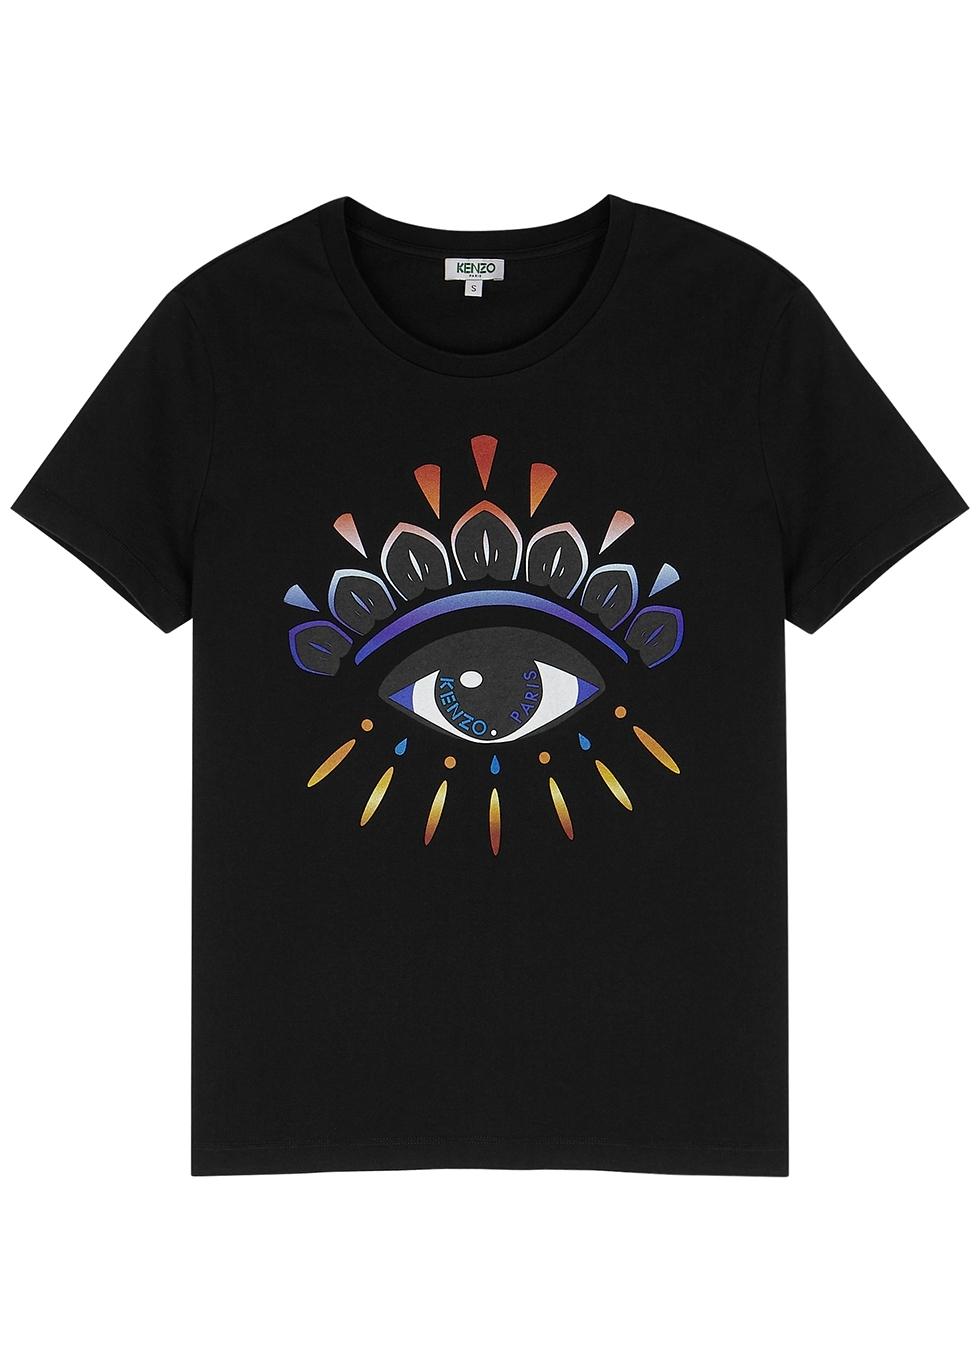 664236ef5368 Kenzo - Designer Sweatshirts, T-Shirts, Bags - Harvey Nichols